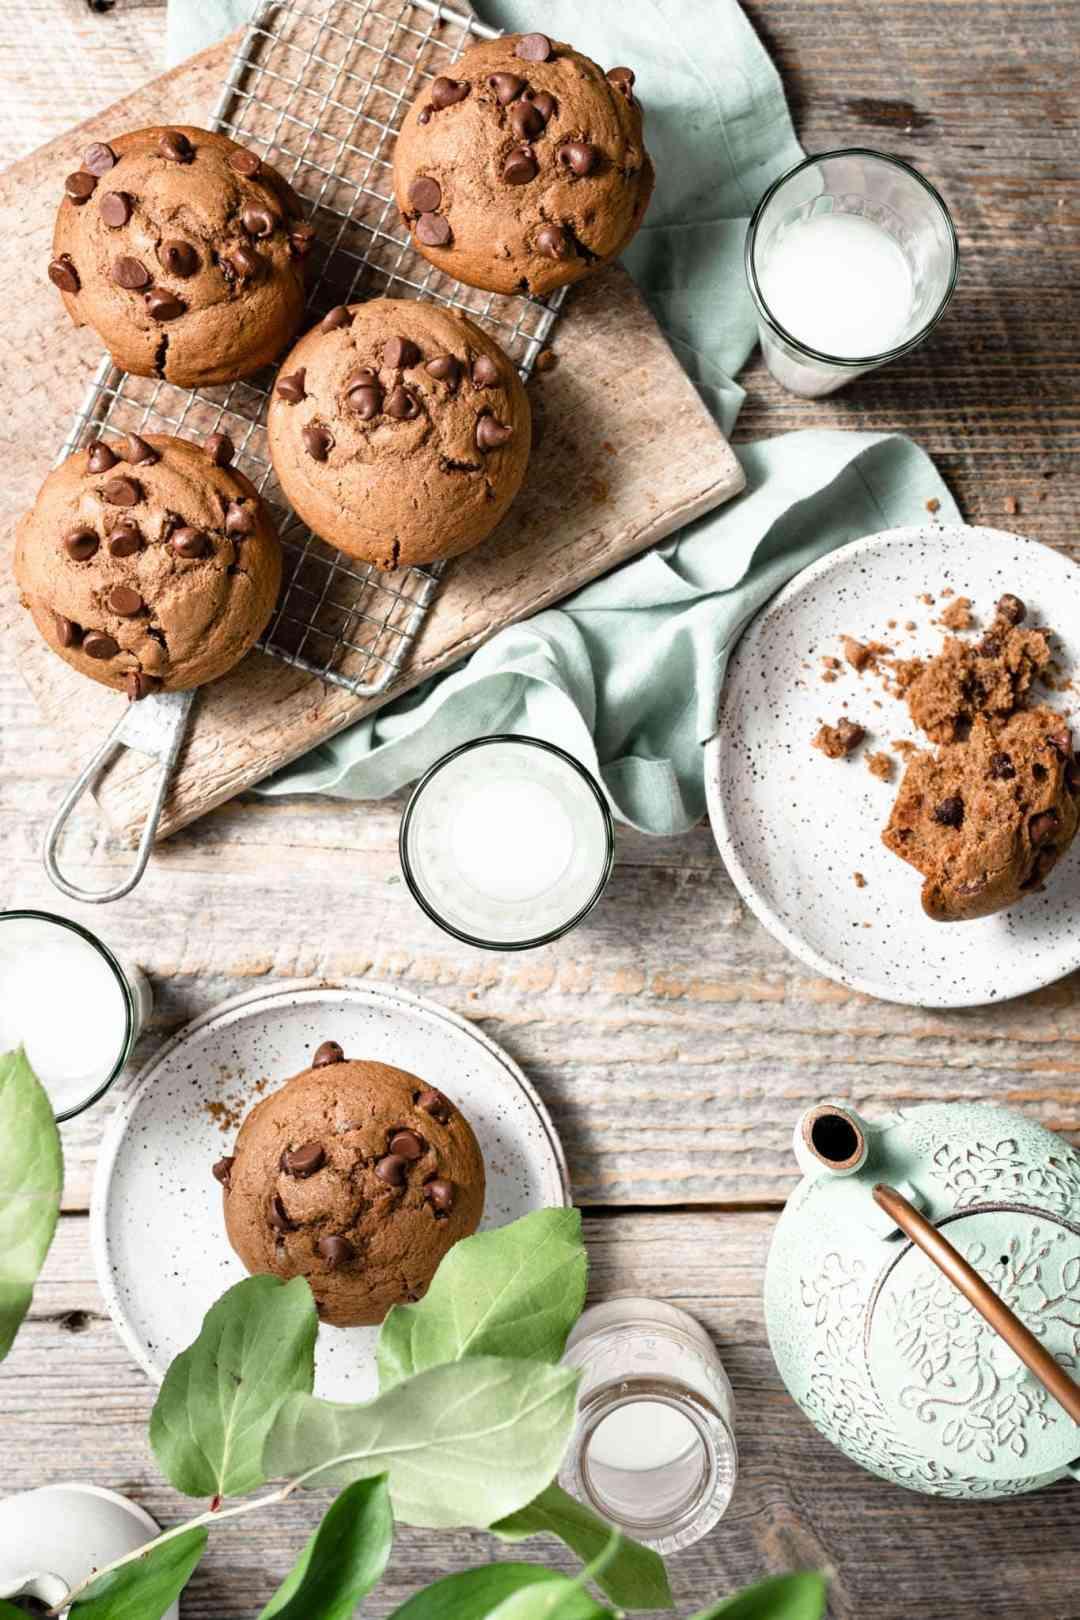 Chocolate Muffin Recipe served with milk.